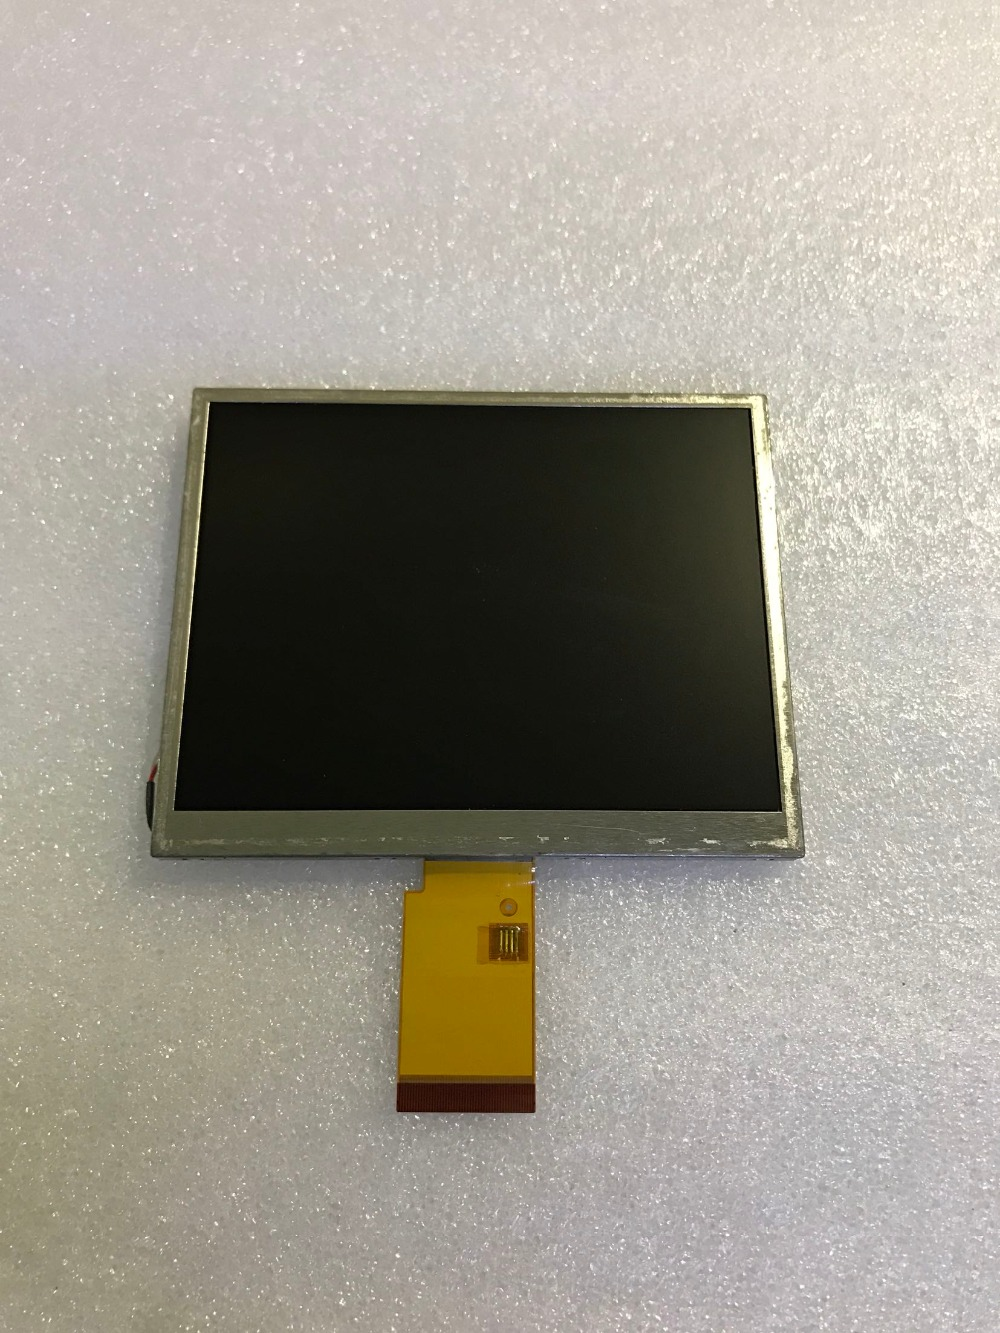 free shipping Original New 5.7 inch LCD screen Model: LQ057AC213 free shipping original new 7 inch lcd screen model lq070t3gg04